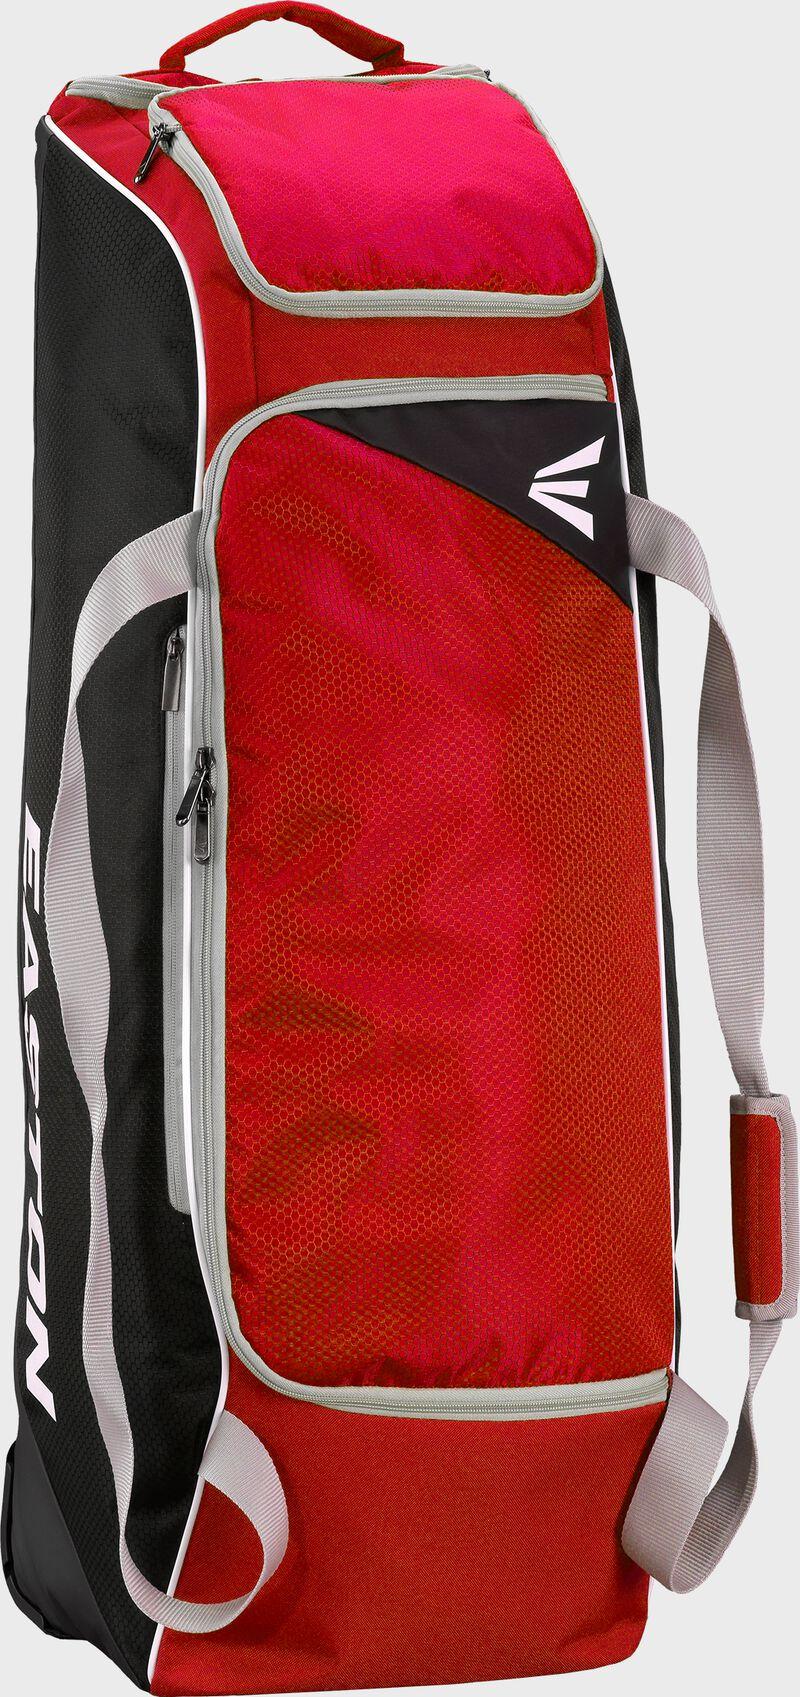 Octane Wheeled Bag | RD